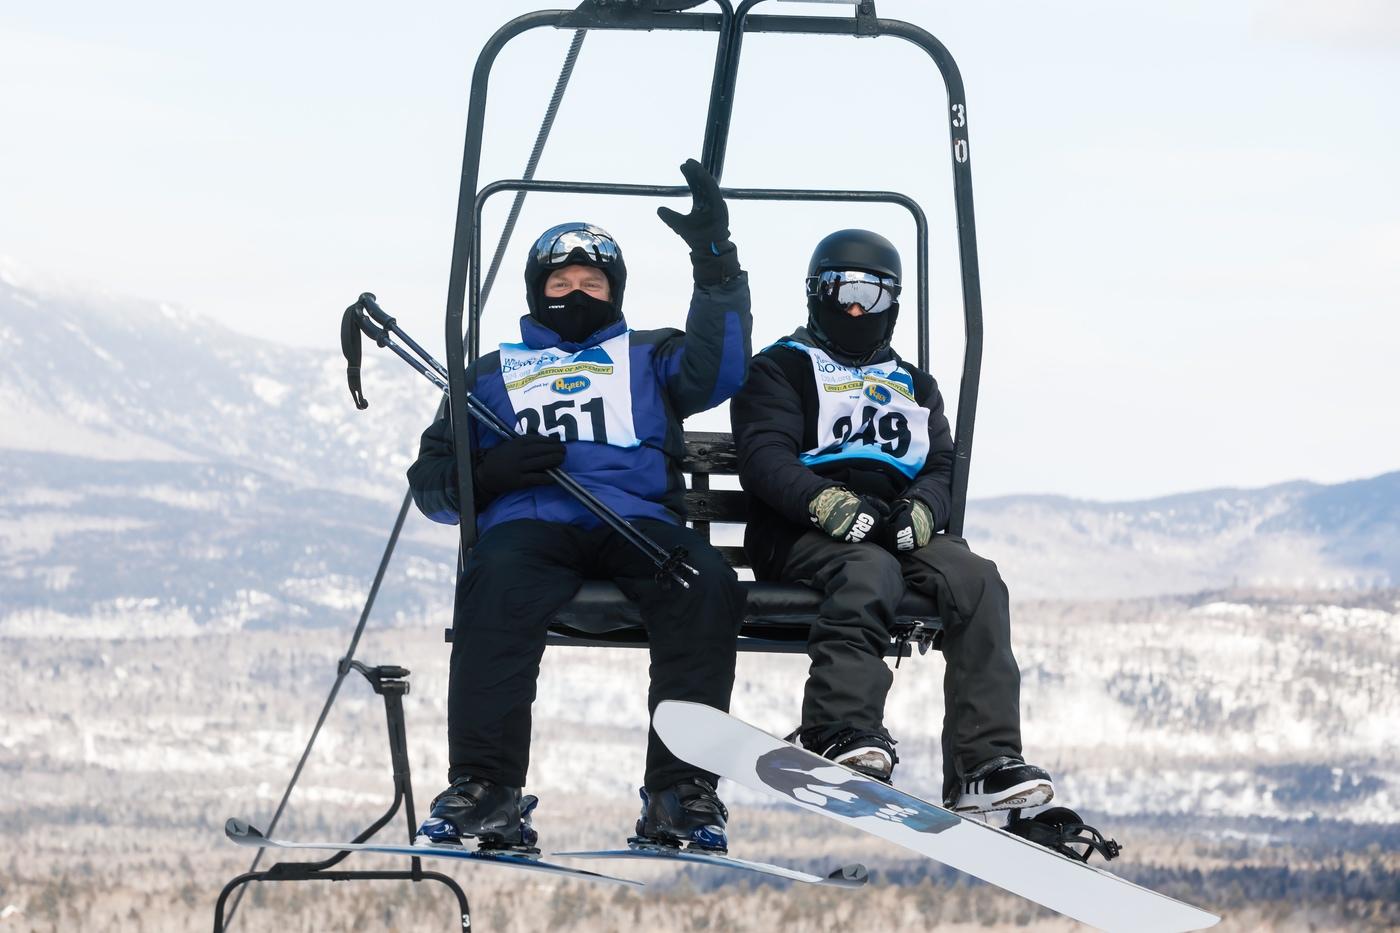 WinterKids Downhill 24 2021 SDP 3474